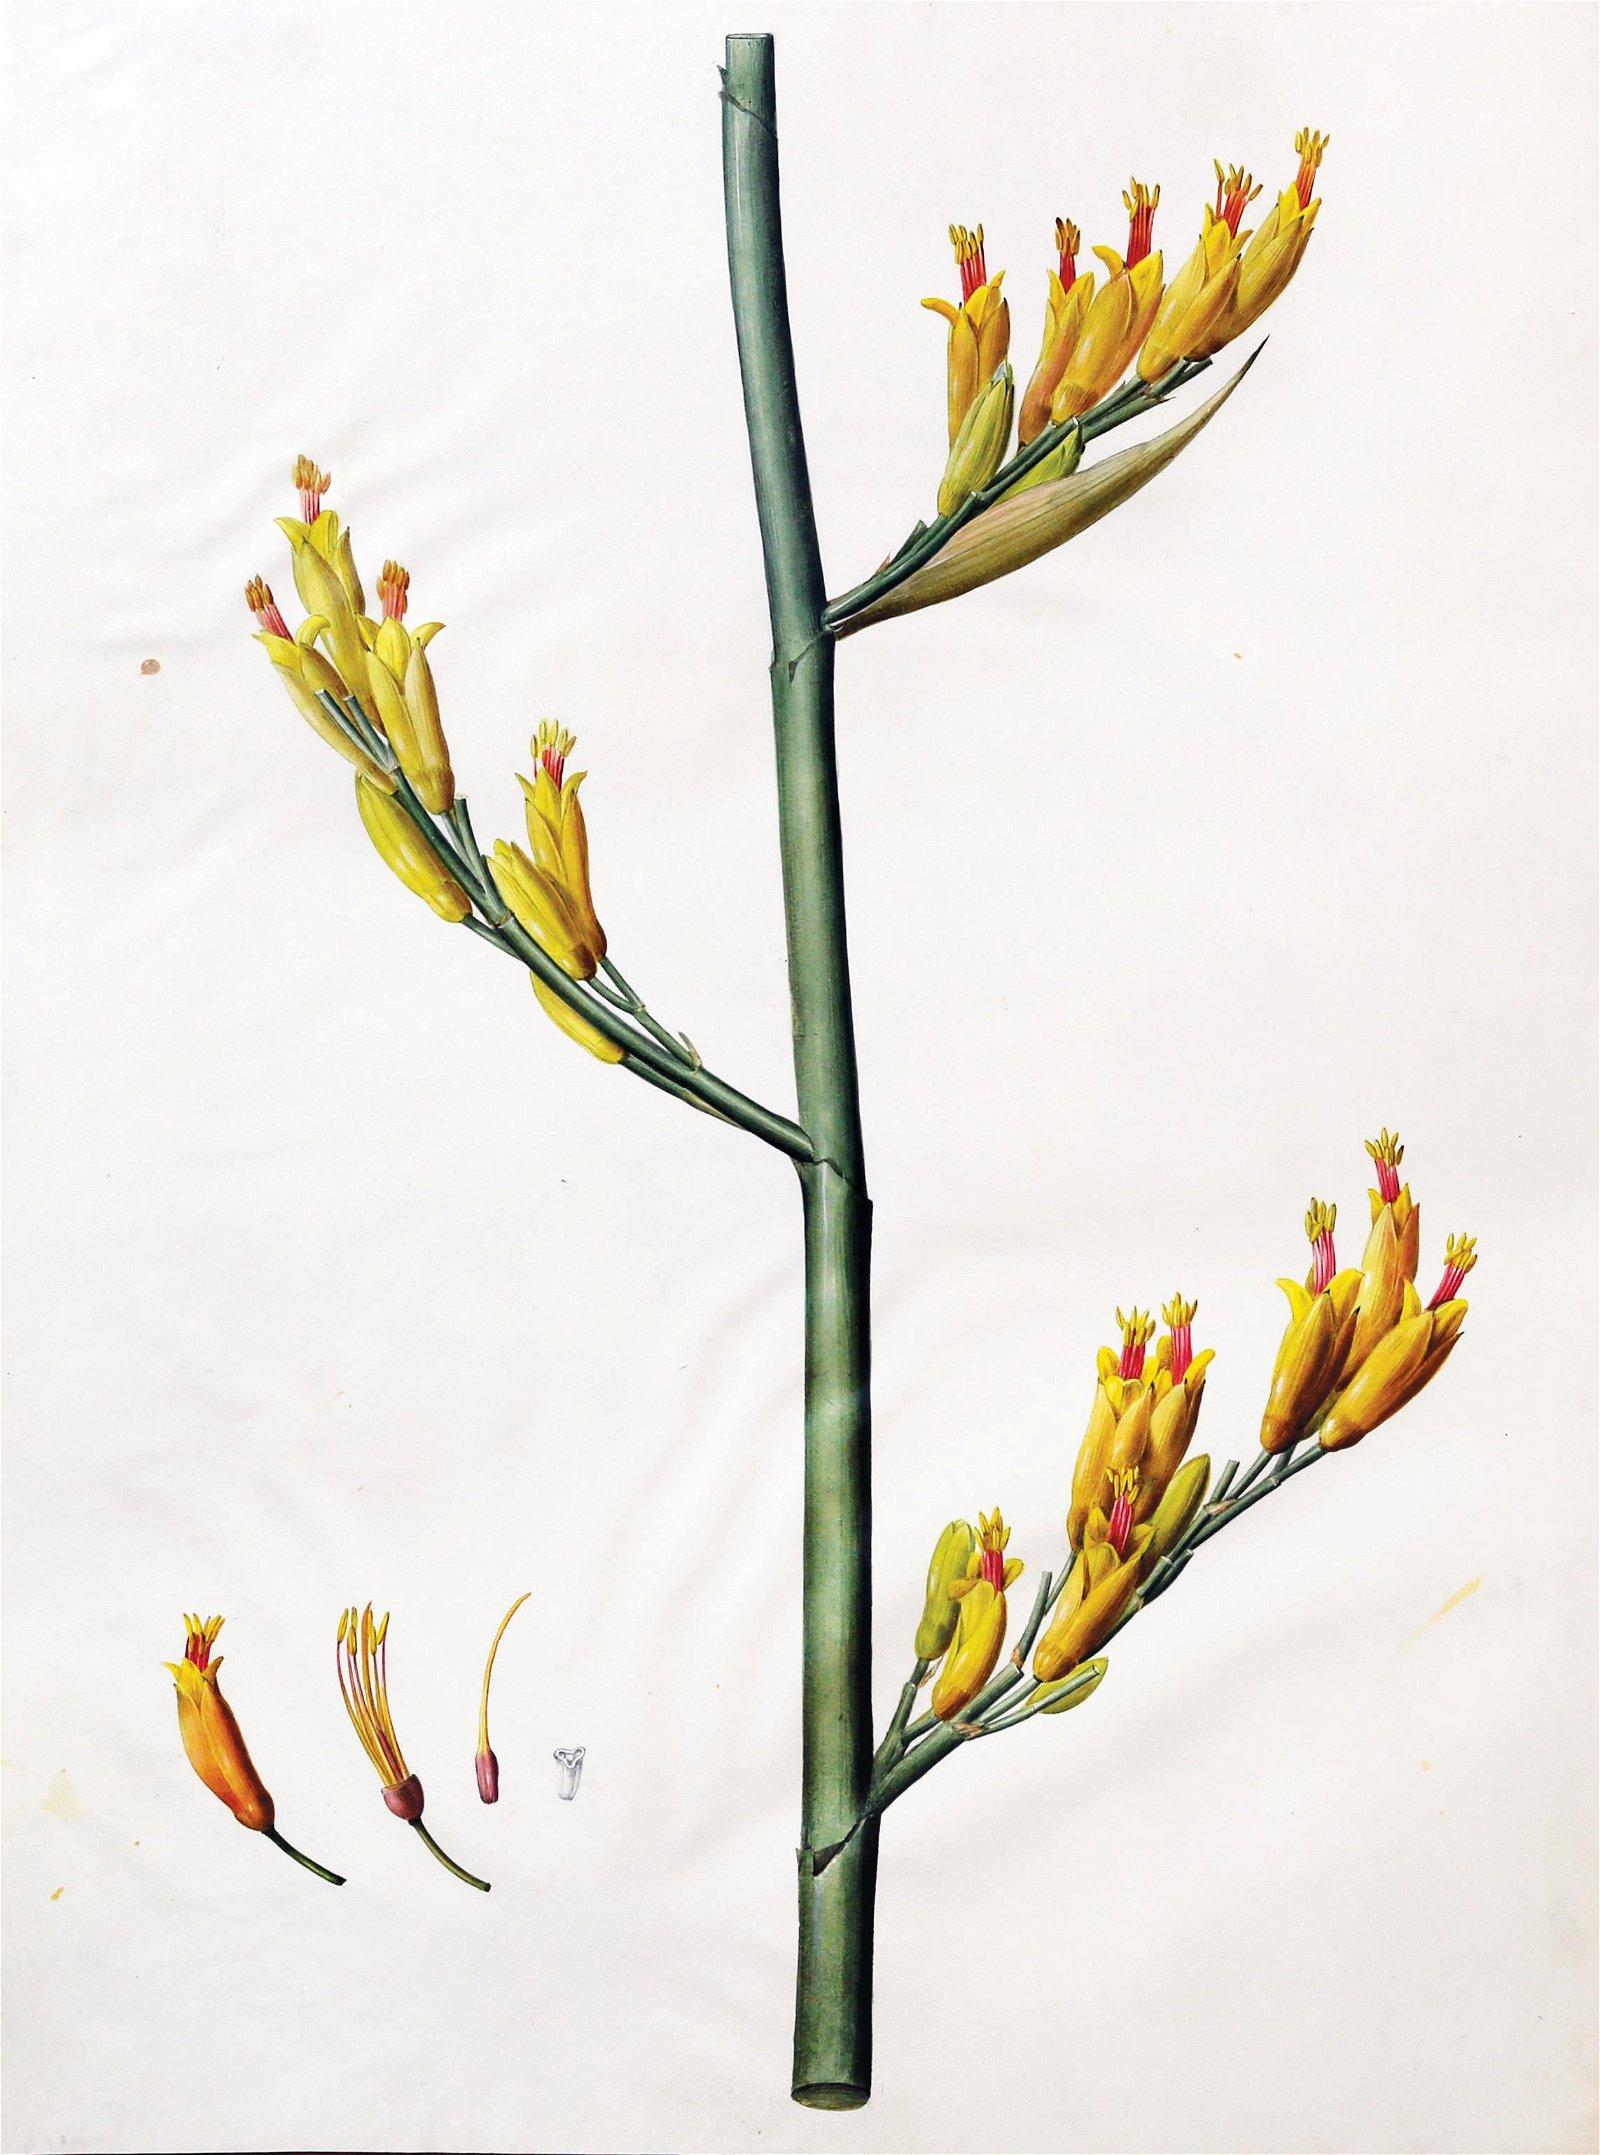 Redoute Original Watercolor, New Zealand Flax